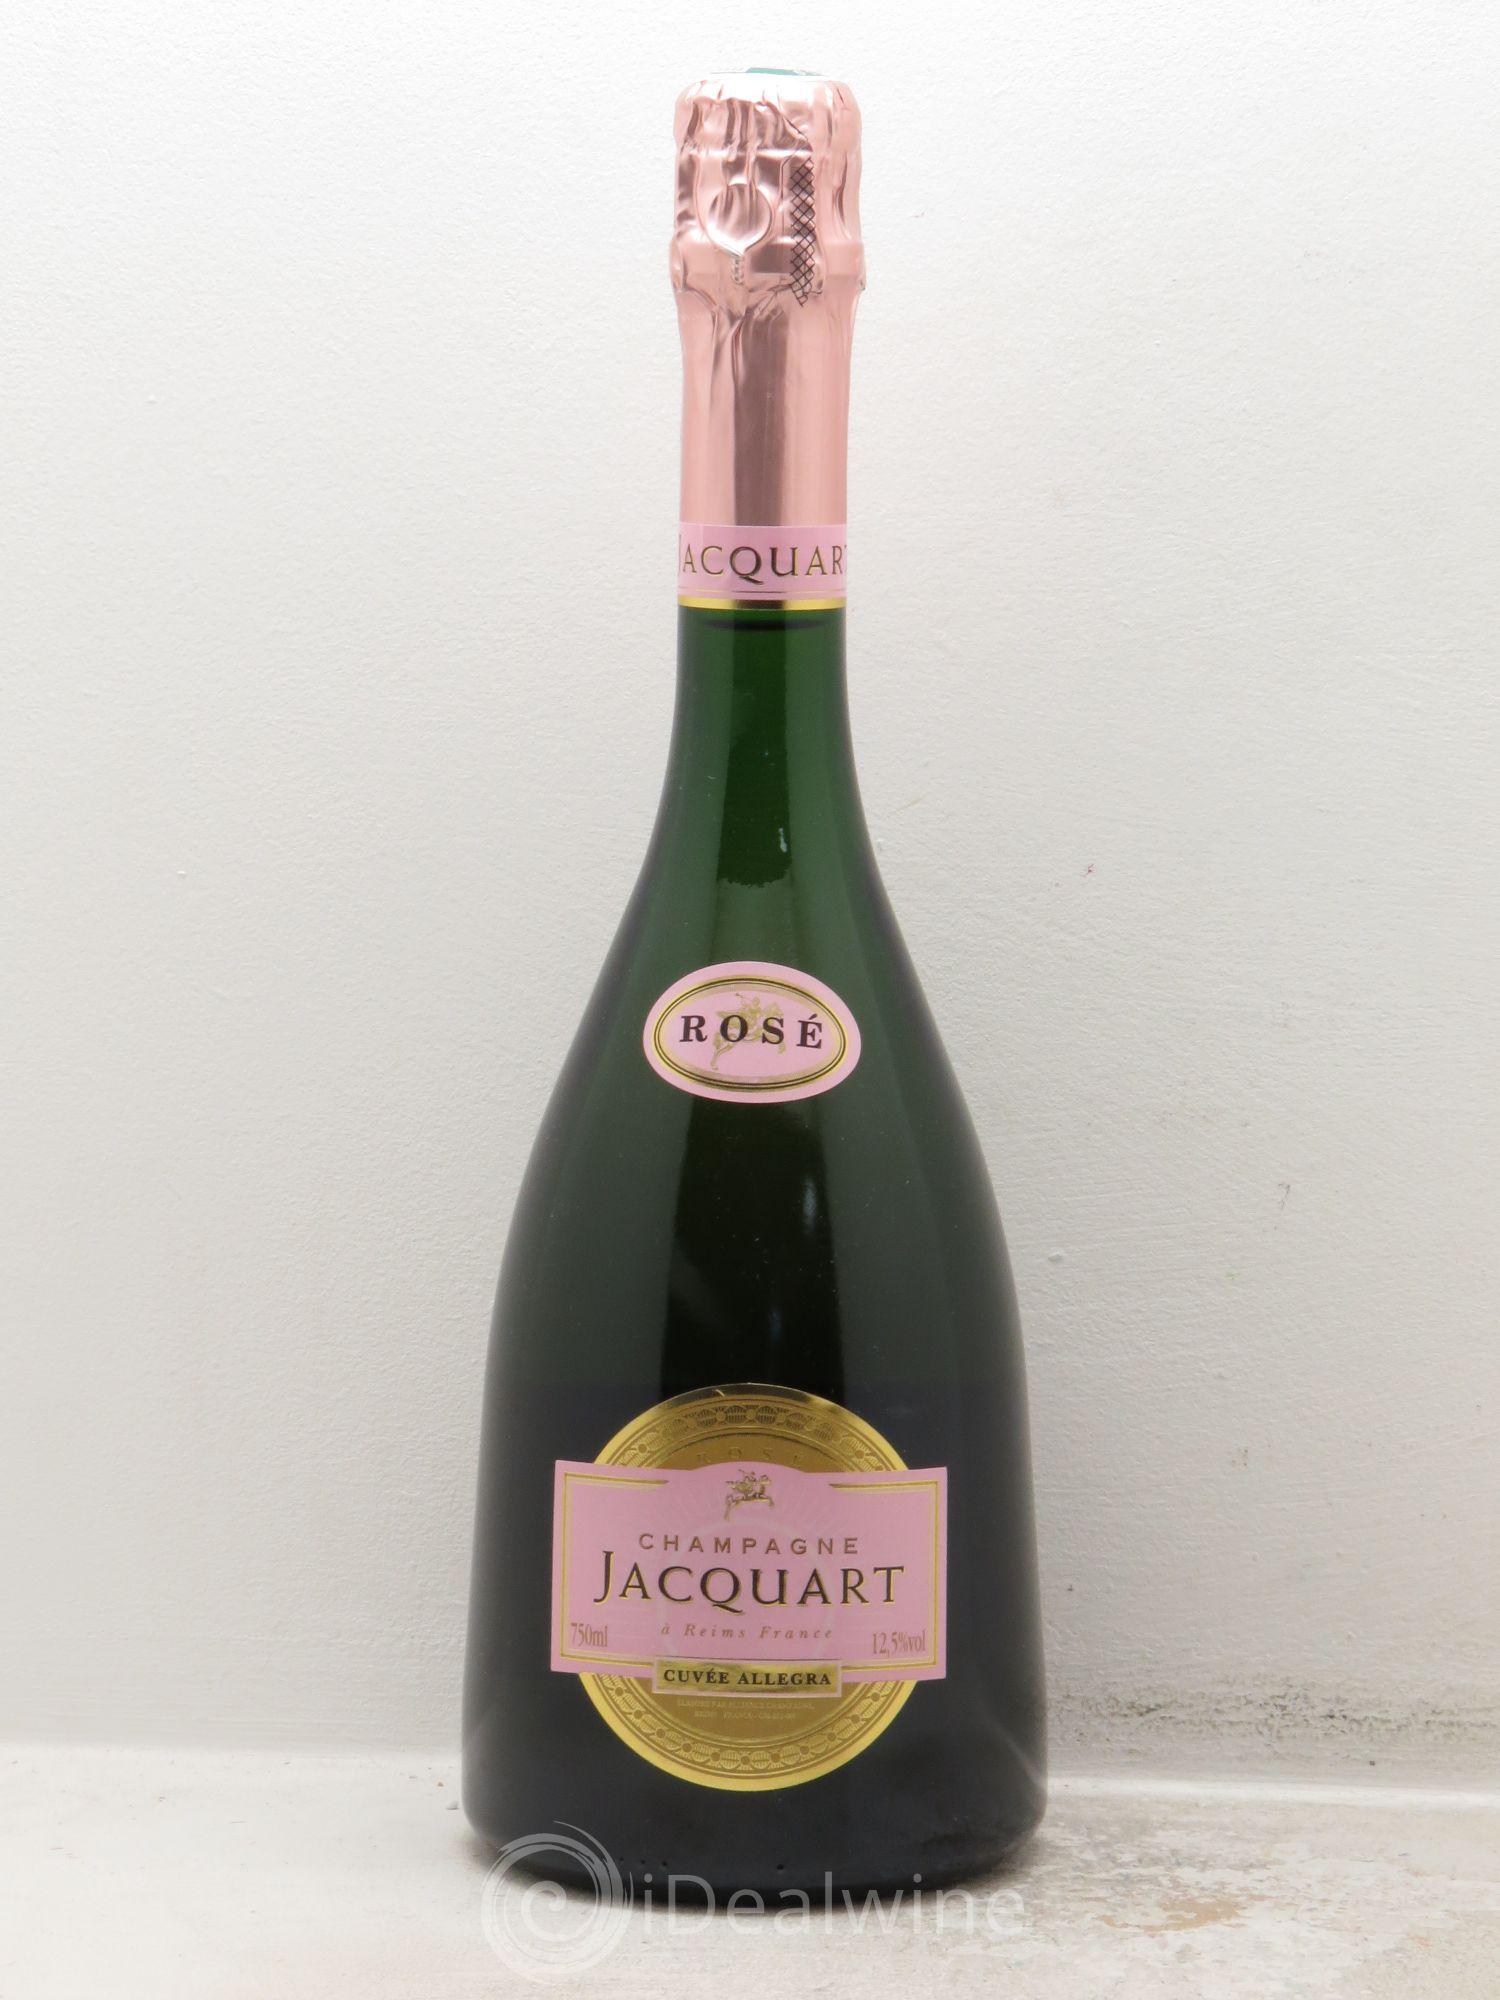 acheter brut champagne jacquart cuv e allegra sans prix de r serve lot 1500. Black Bedroom Furniture Sets. Home Design Ideas